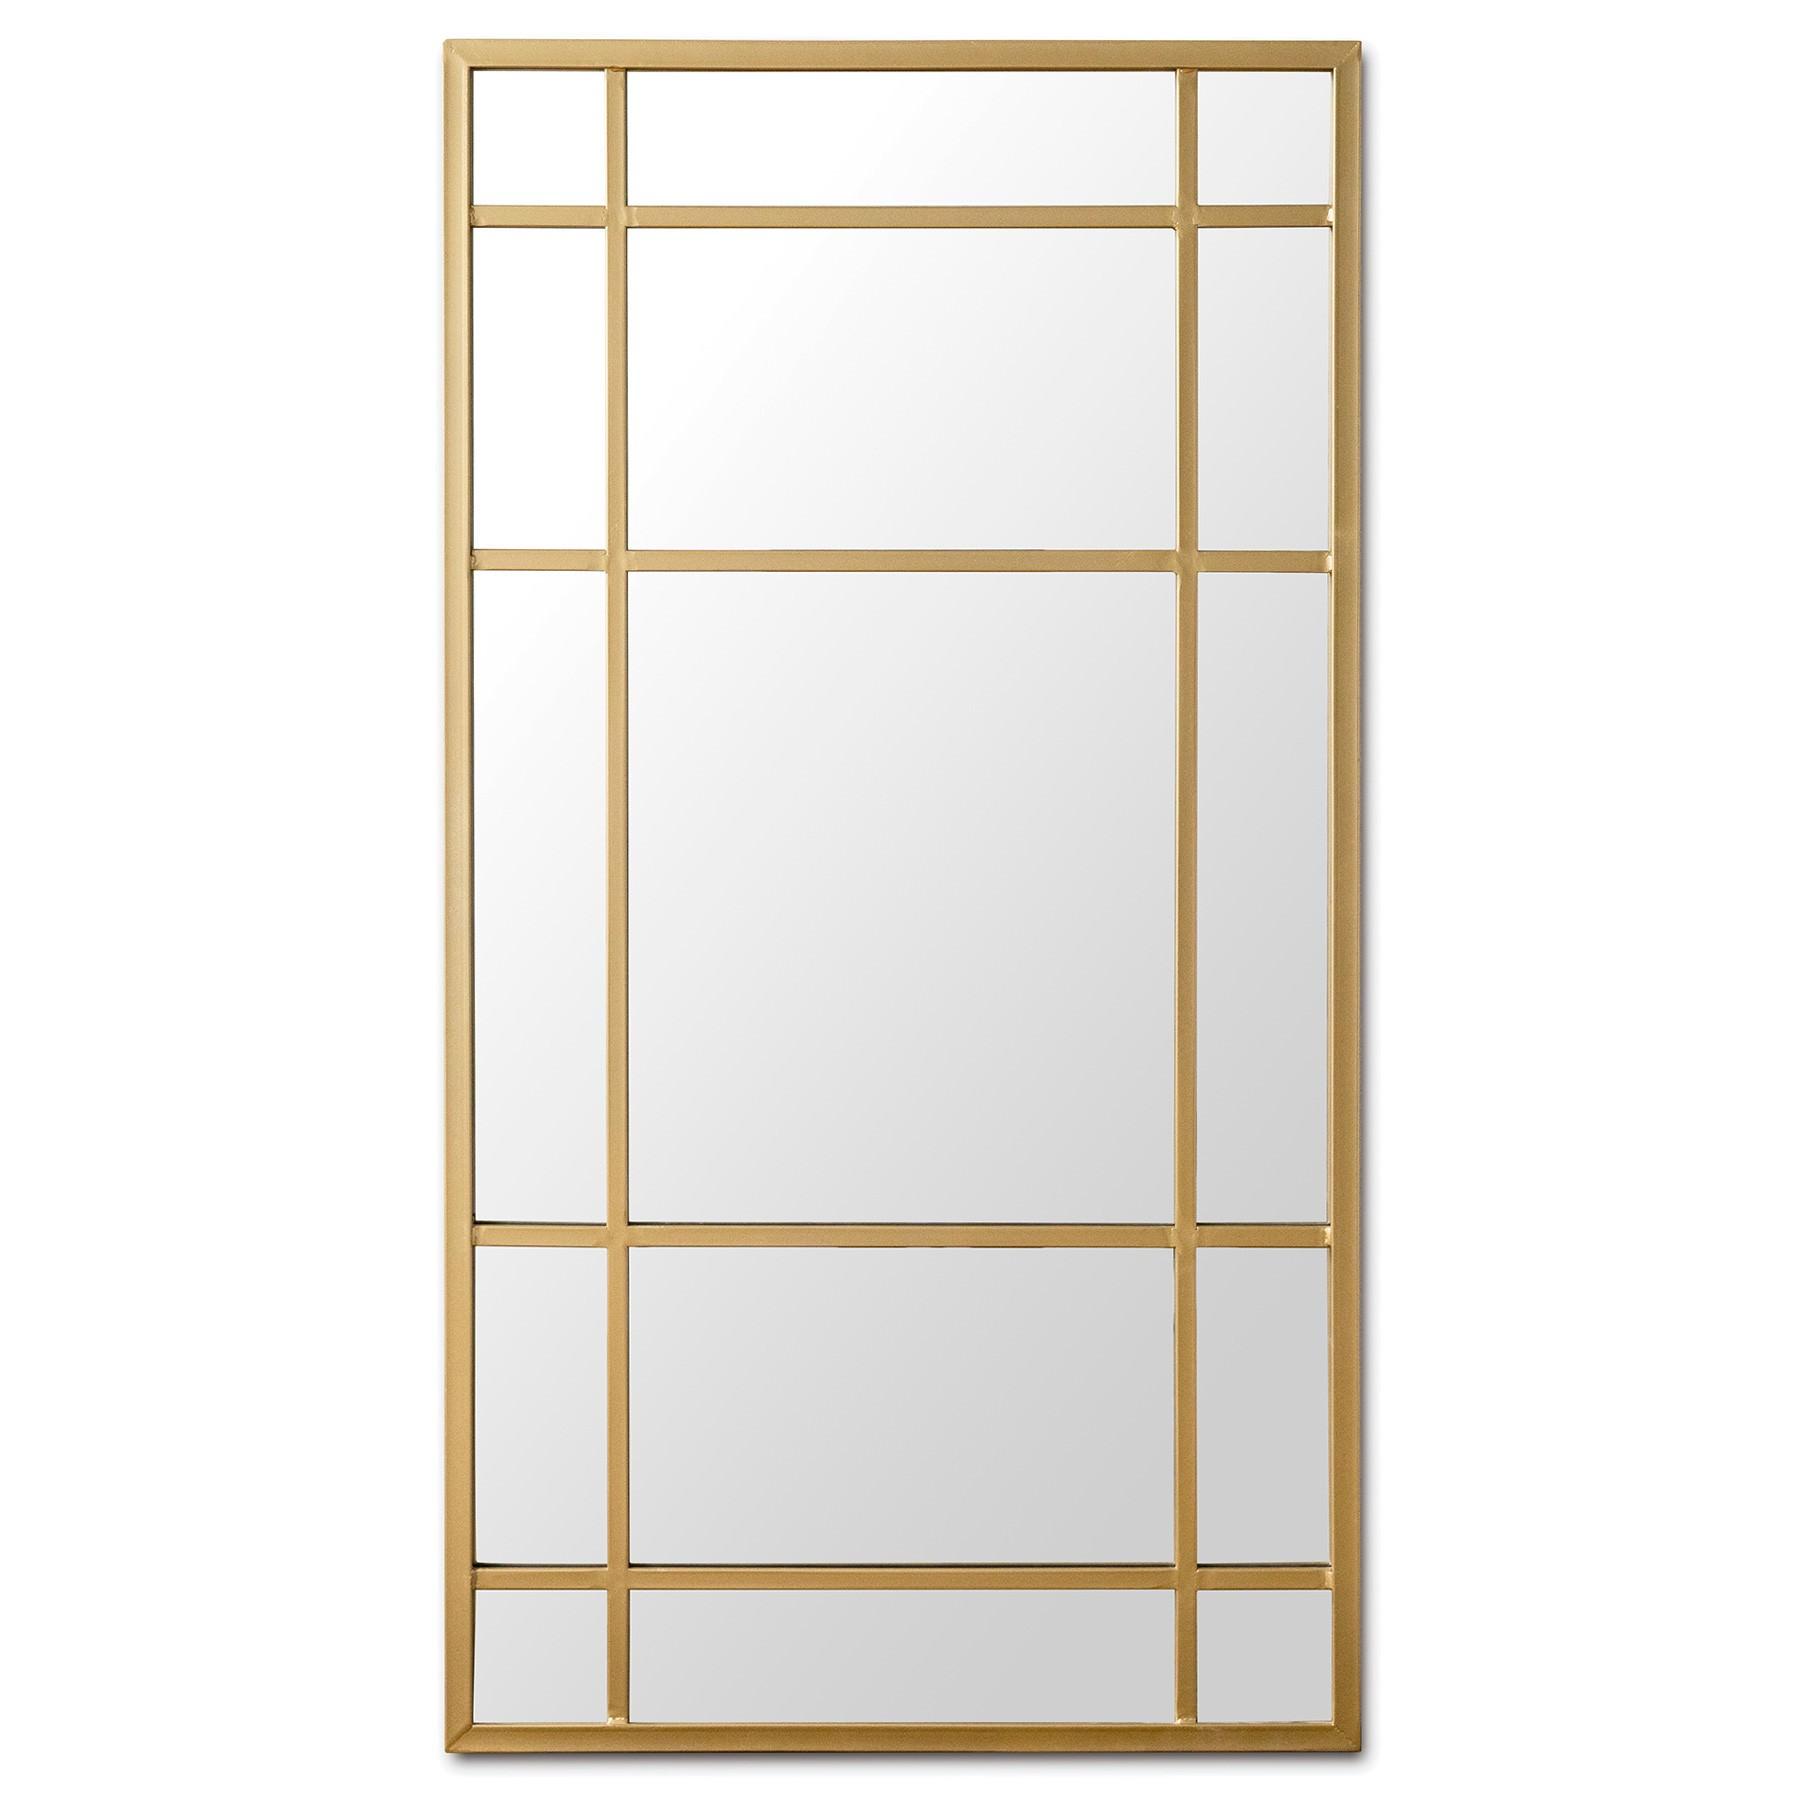 Milner Iron Frame Wall Mirror, 180cm